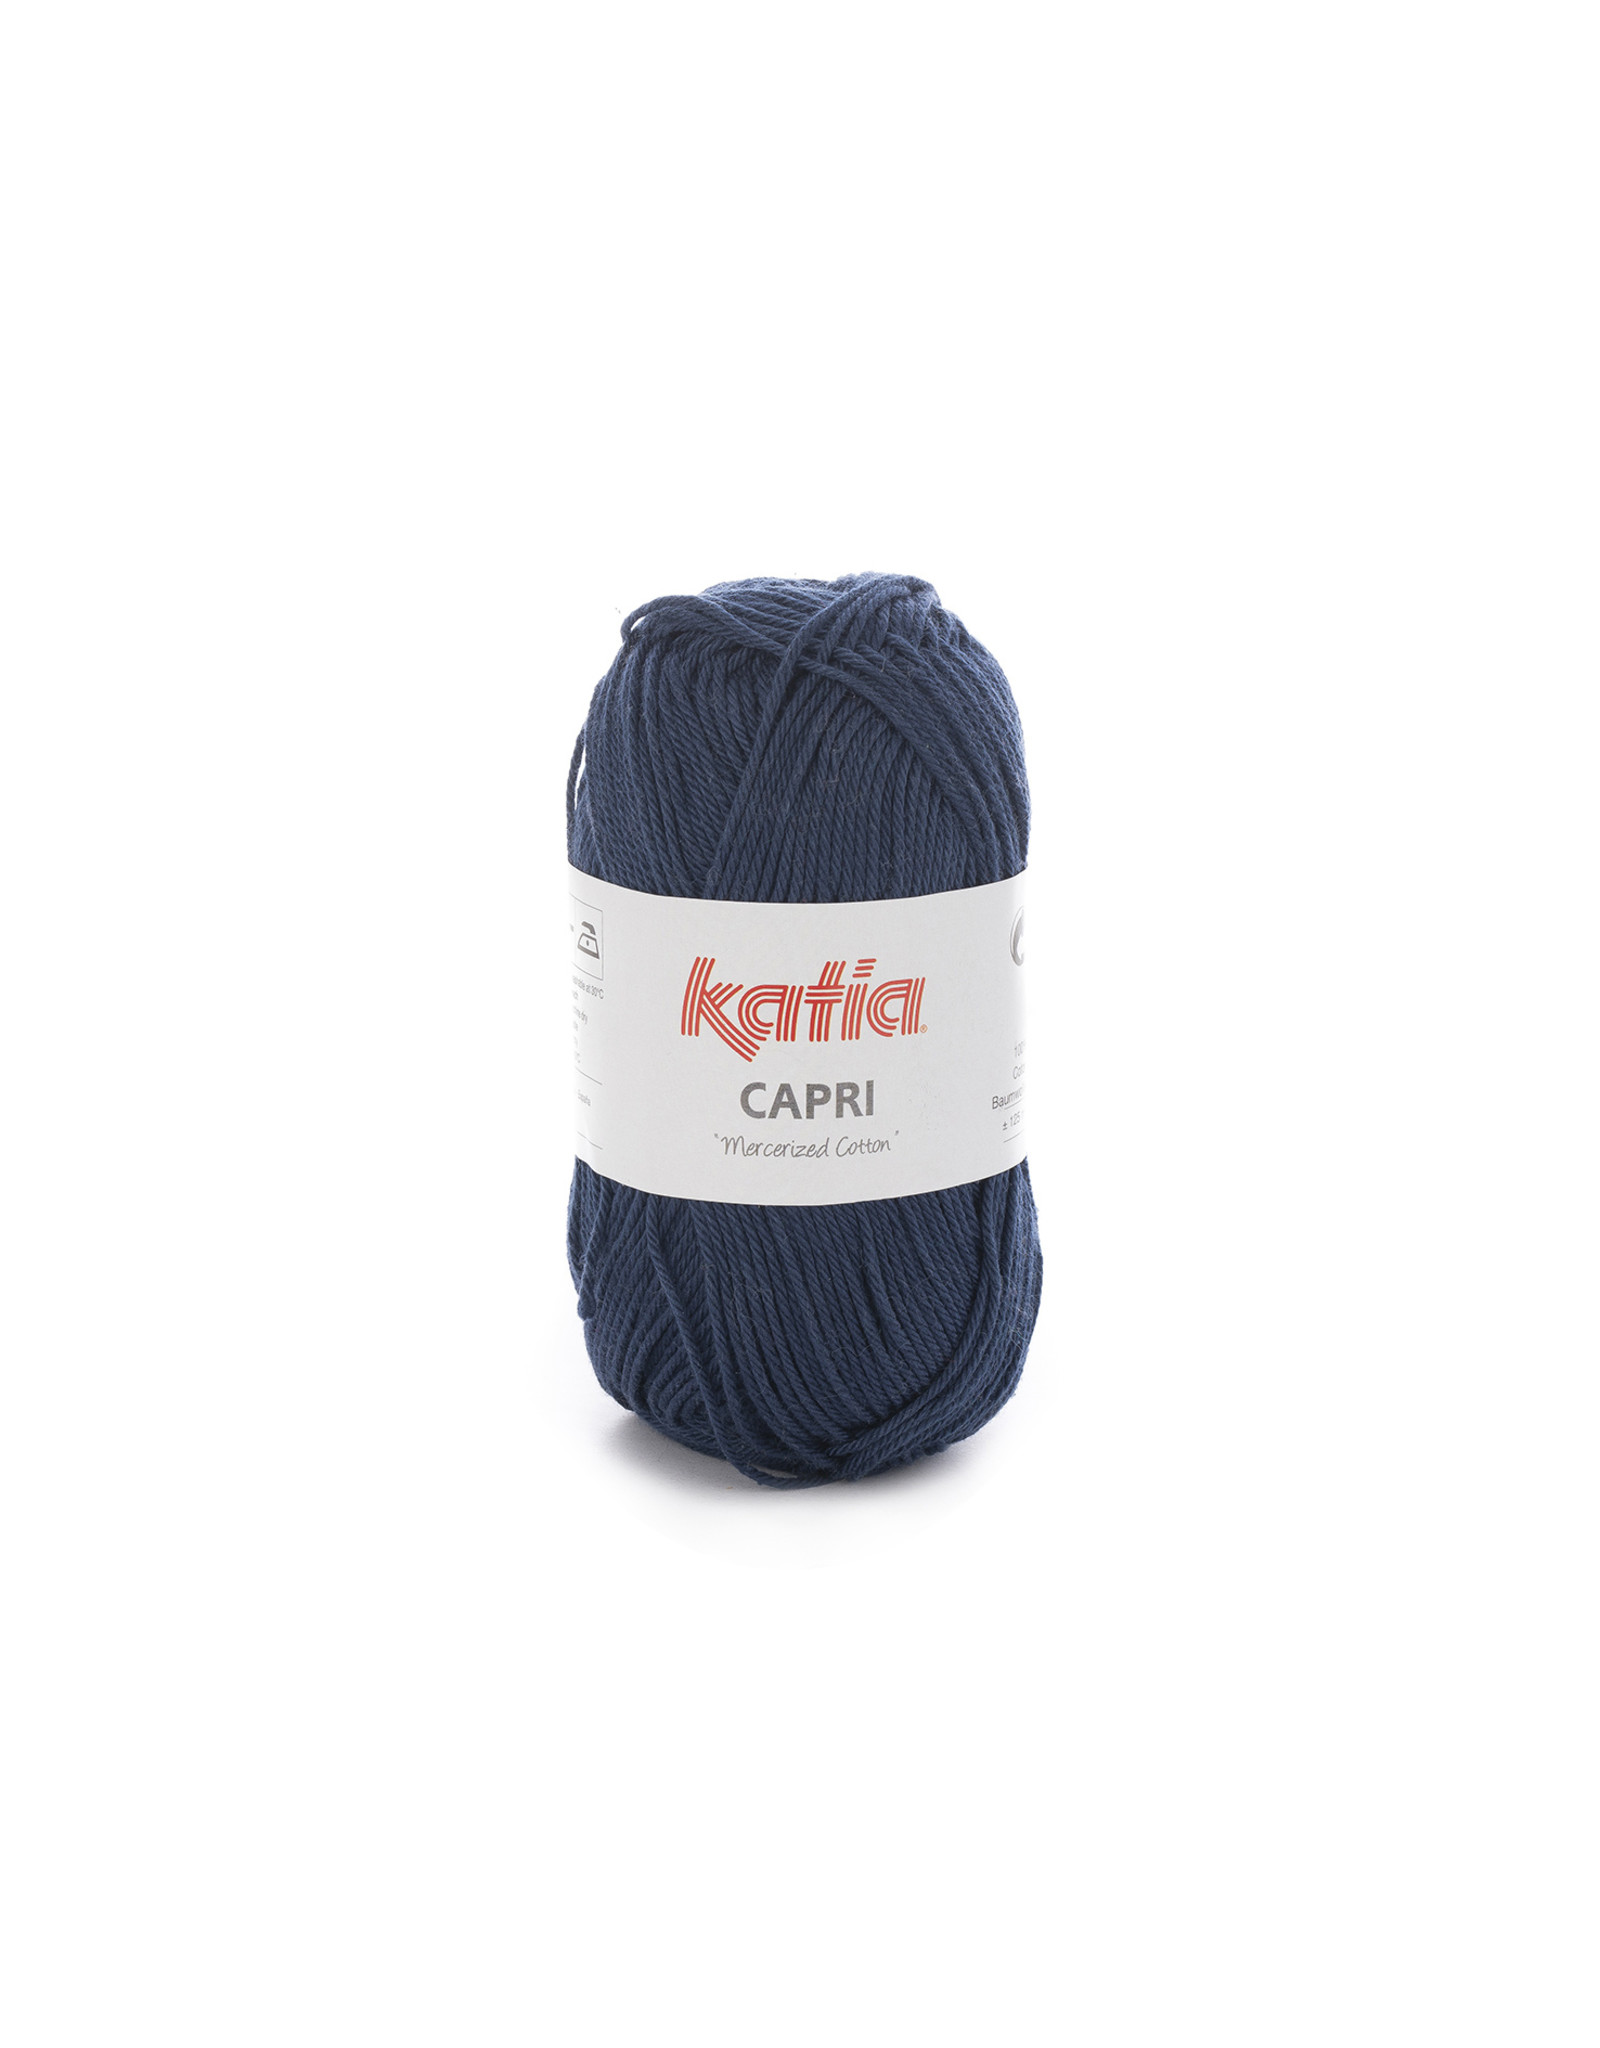 Katia Katia Capri - kleur 66 Donker blauw - 50 gr. = 125 m. - 100% katoen